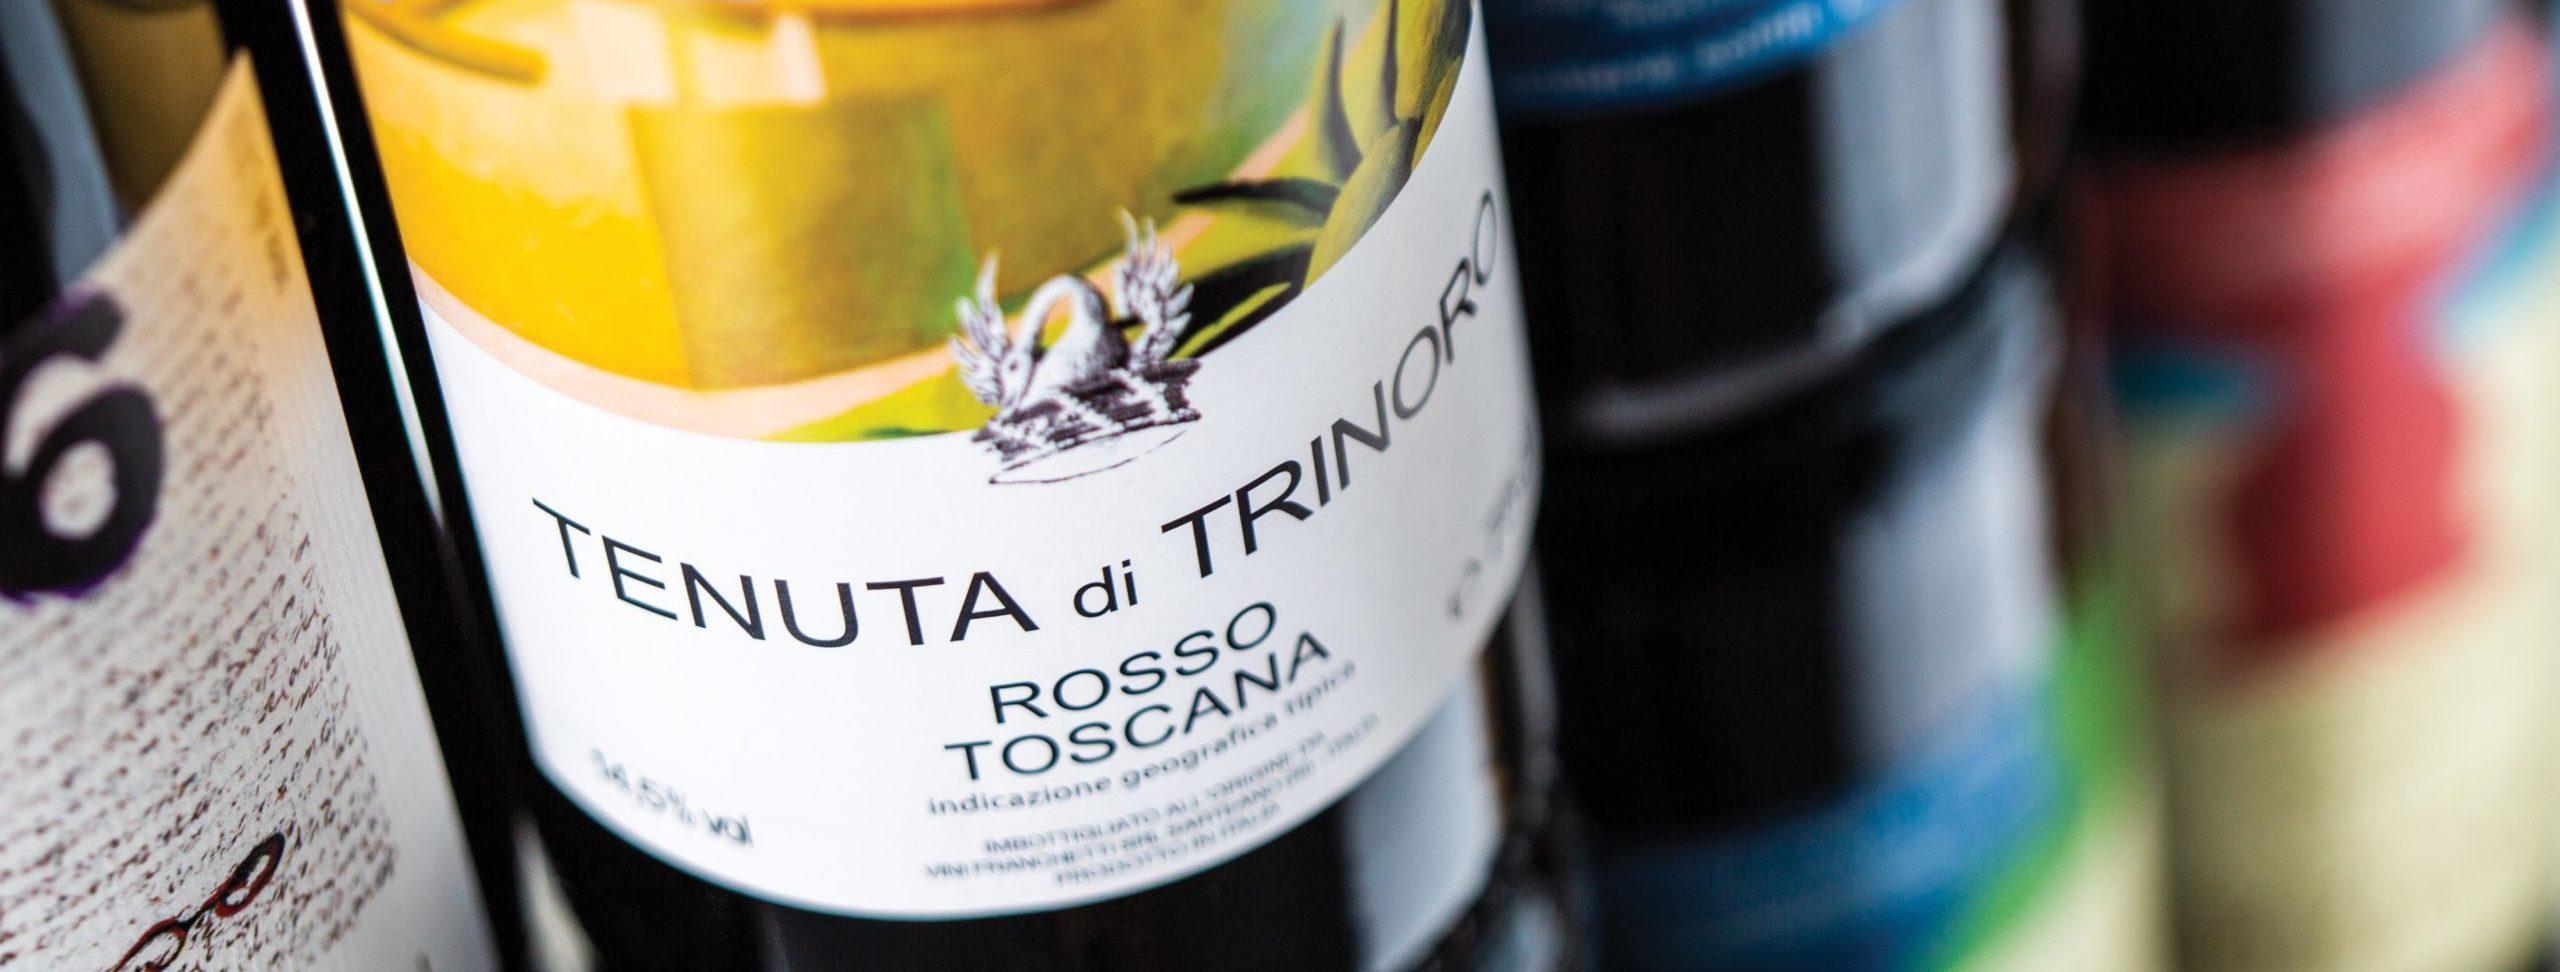 Vini Franchetti: Tuscany & Sicily